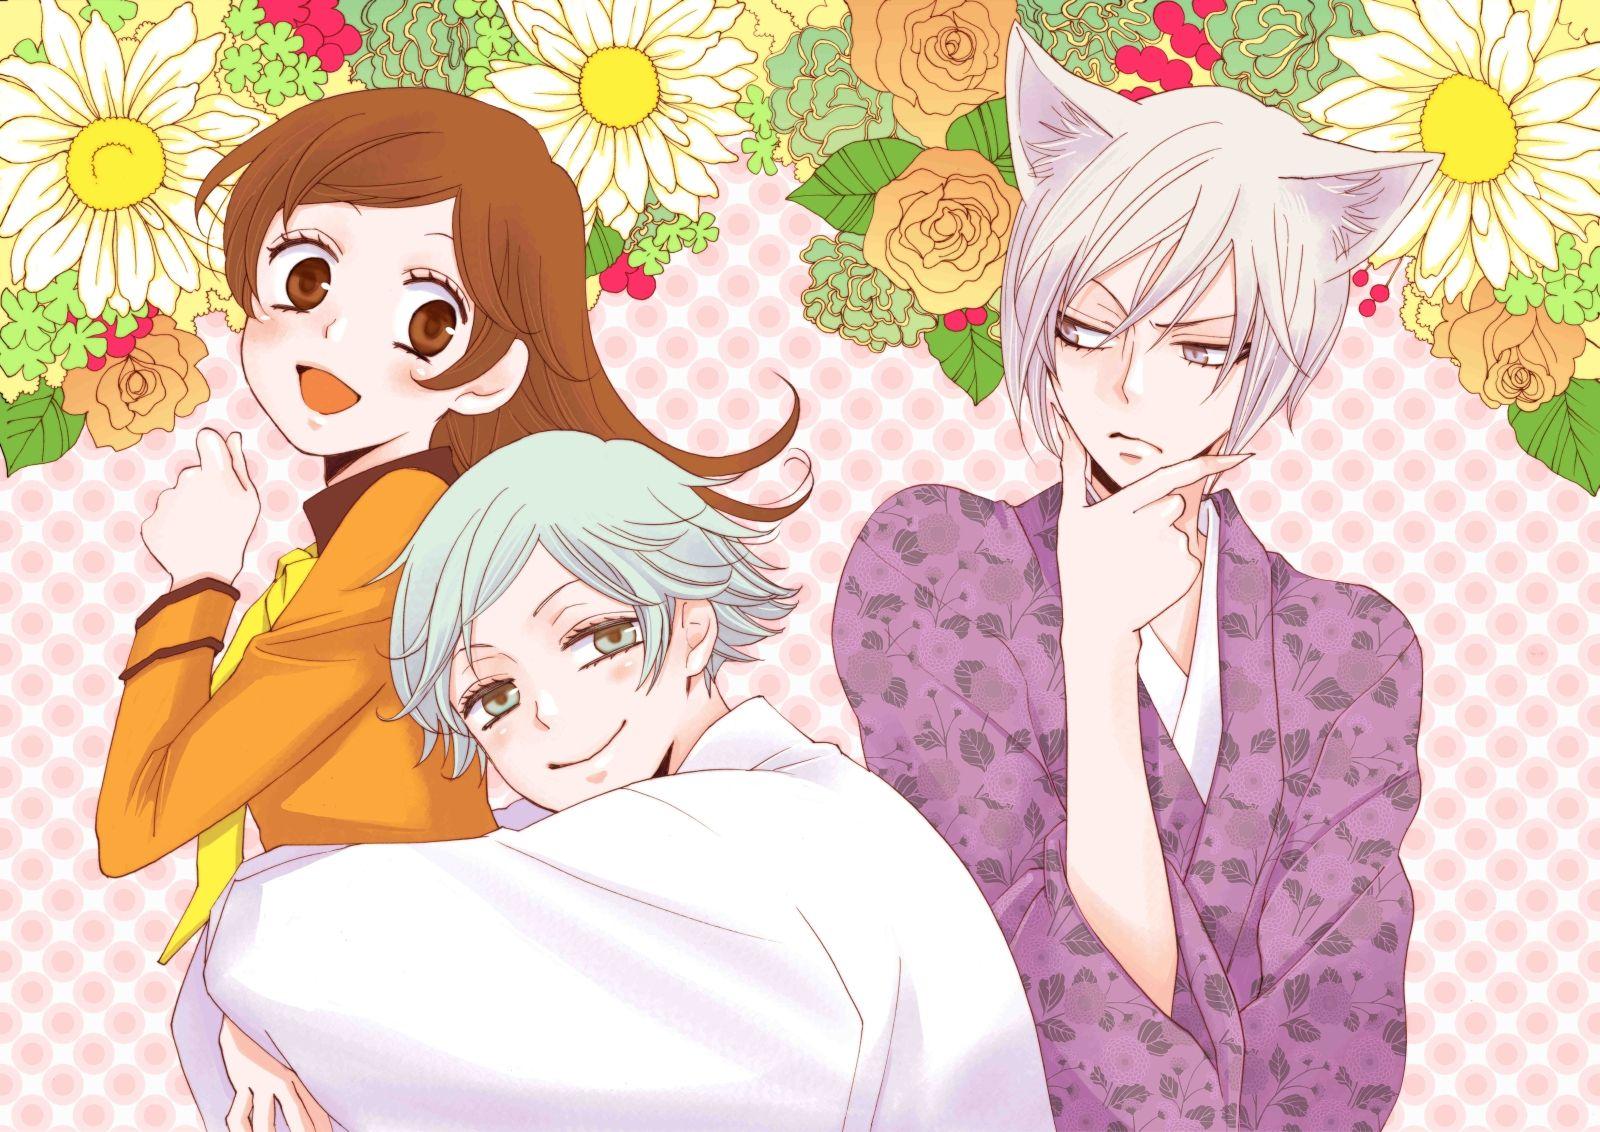 Pin by Chloe love anime on Kamisama Hajimemashita